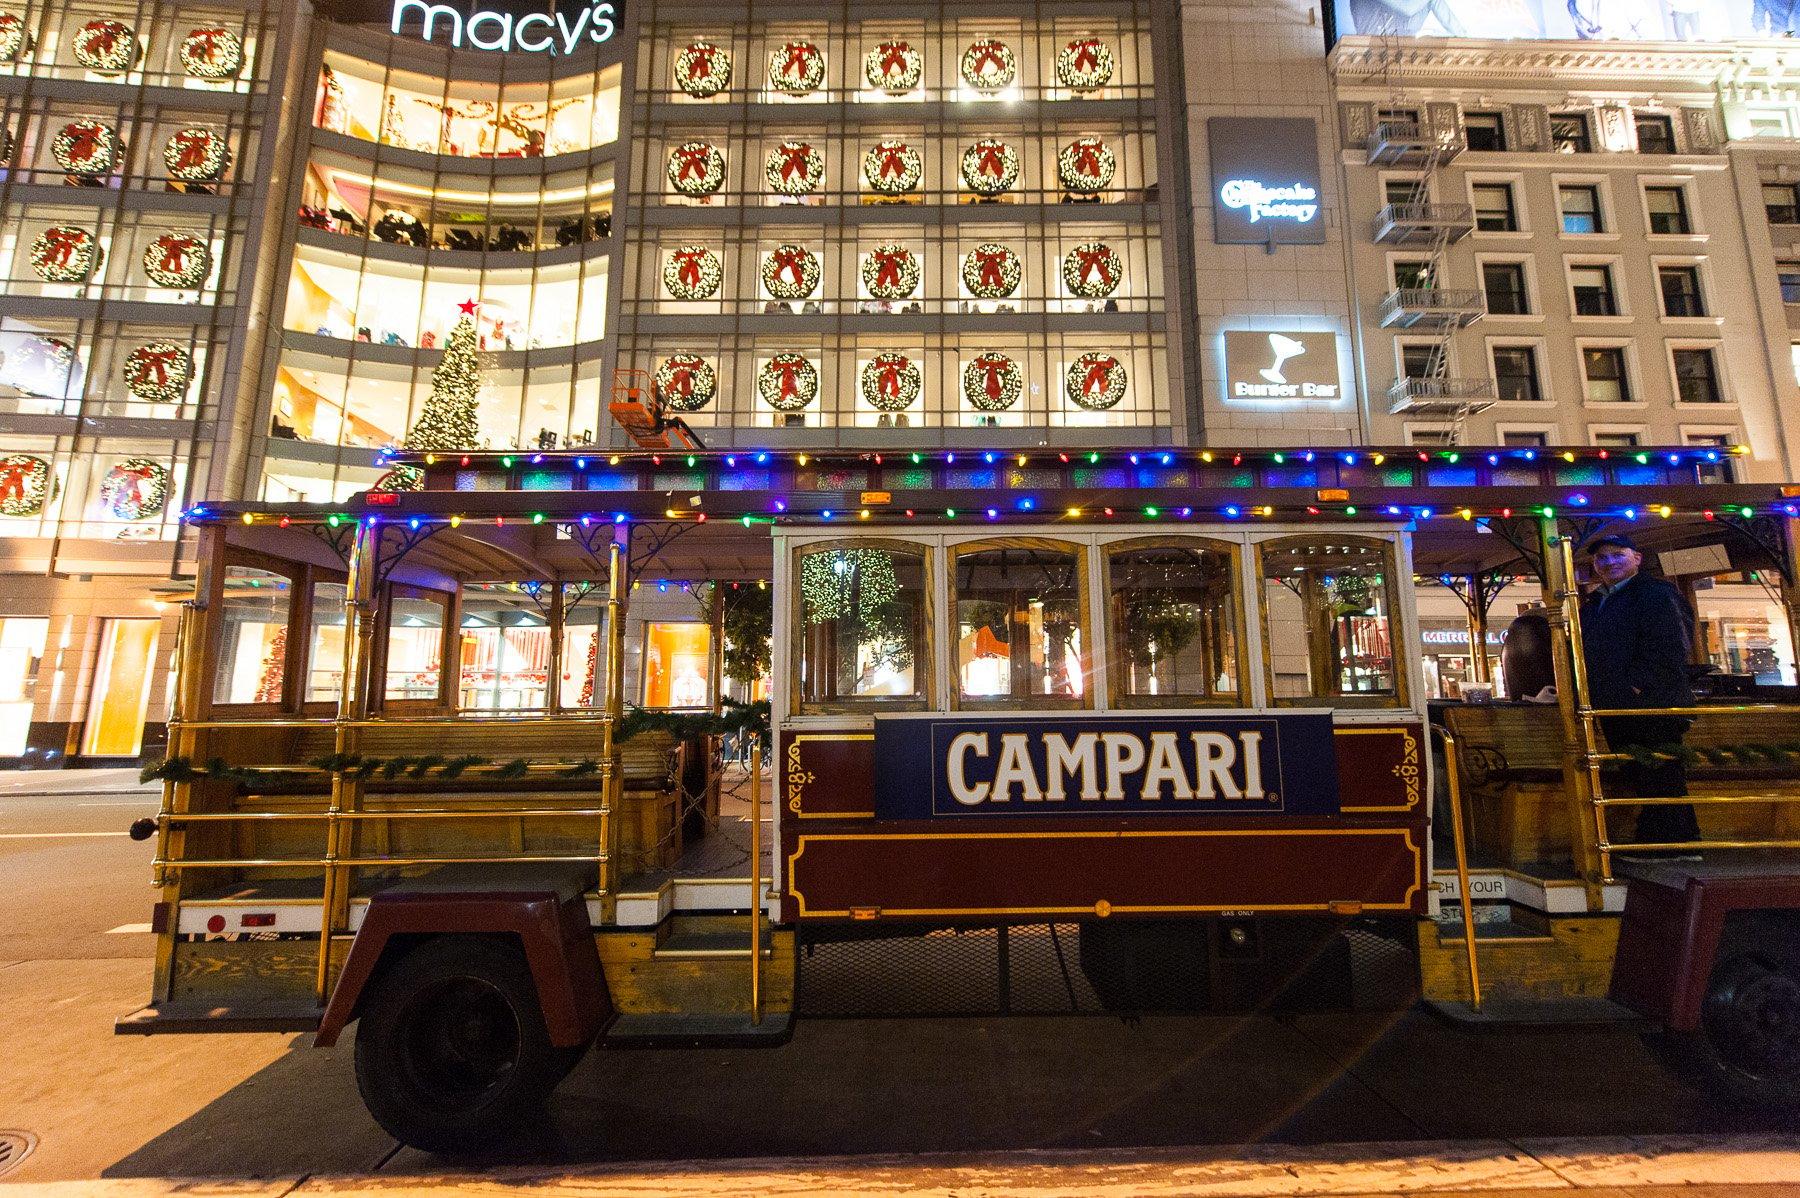 01_12.3.12_Campari_BartendersOnIce_G9Photography_2878